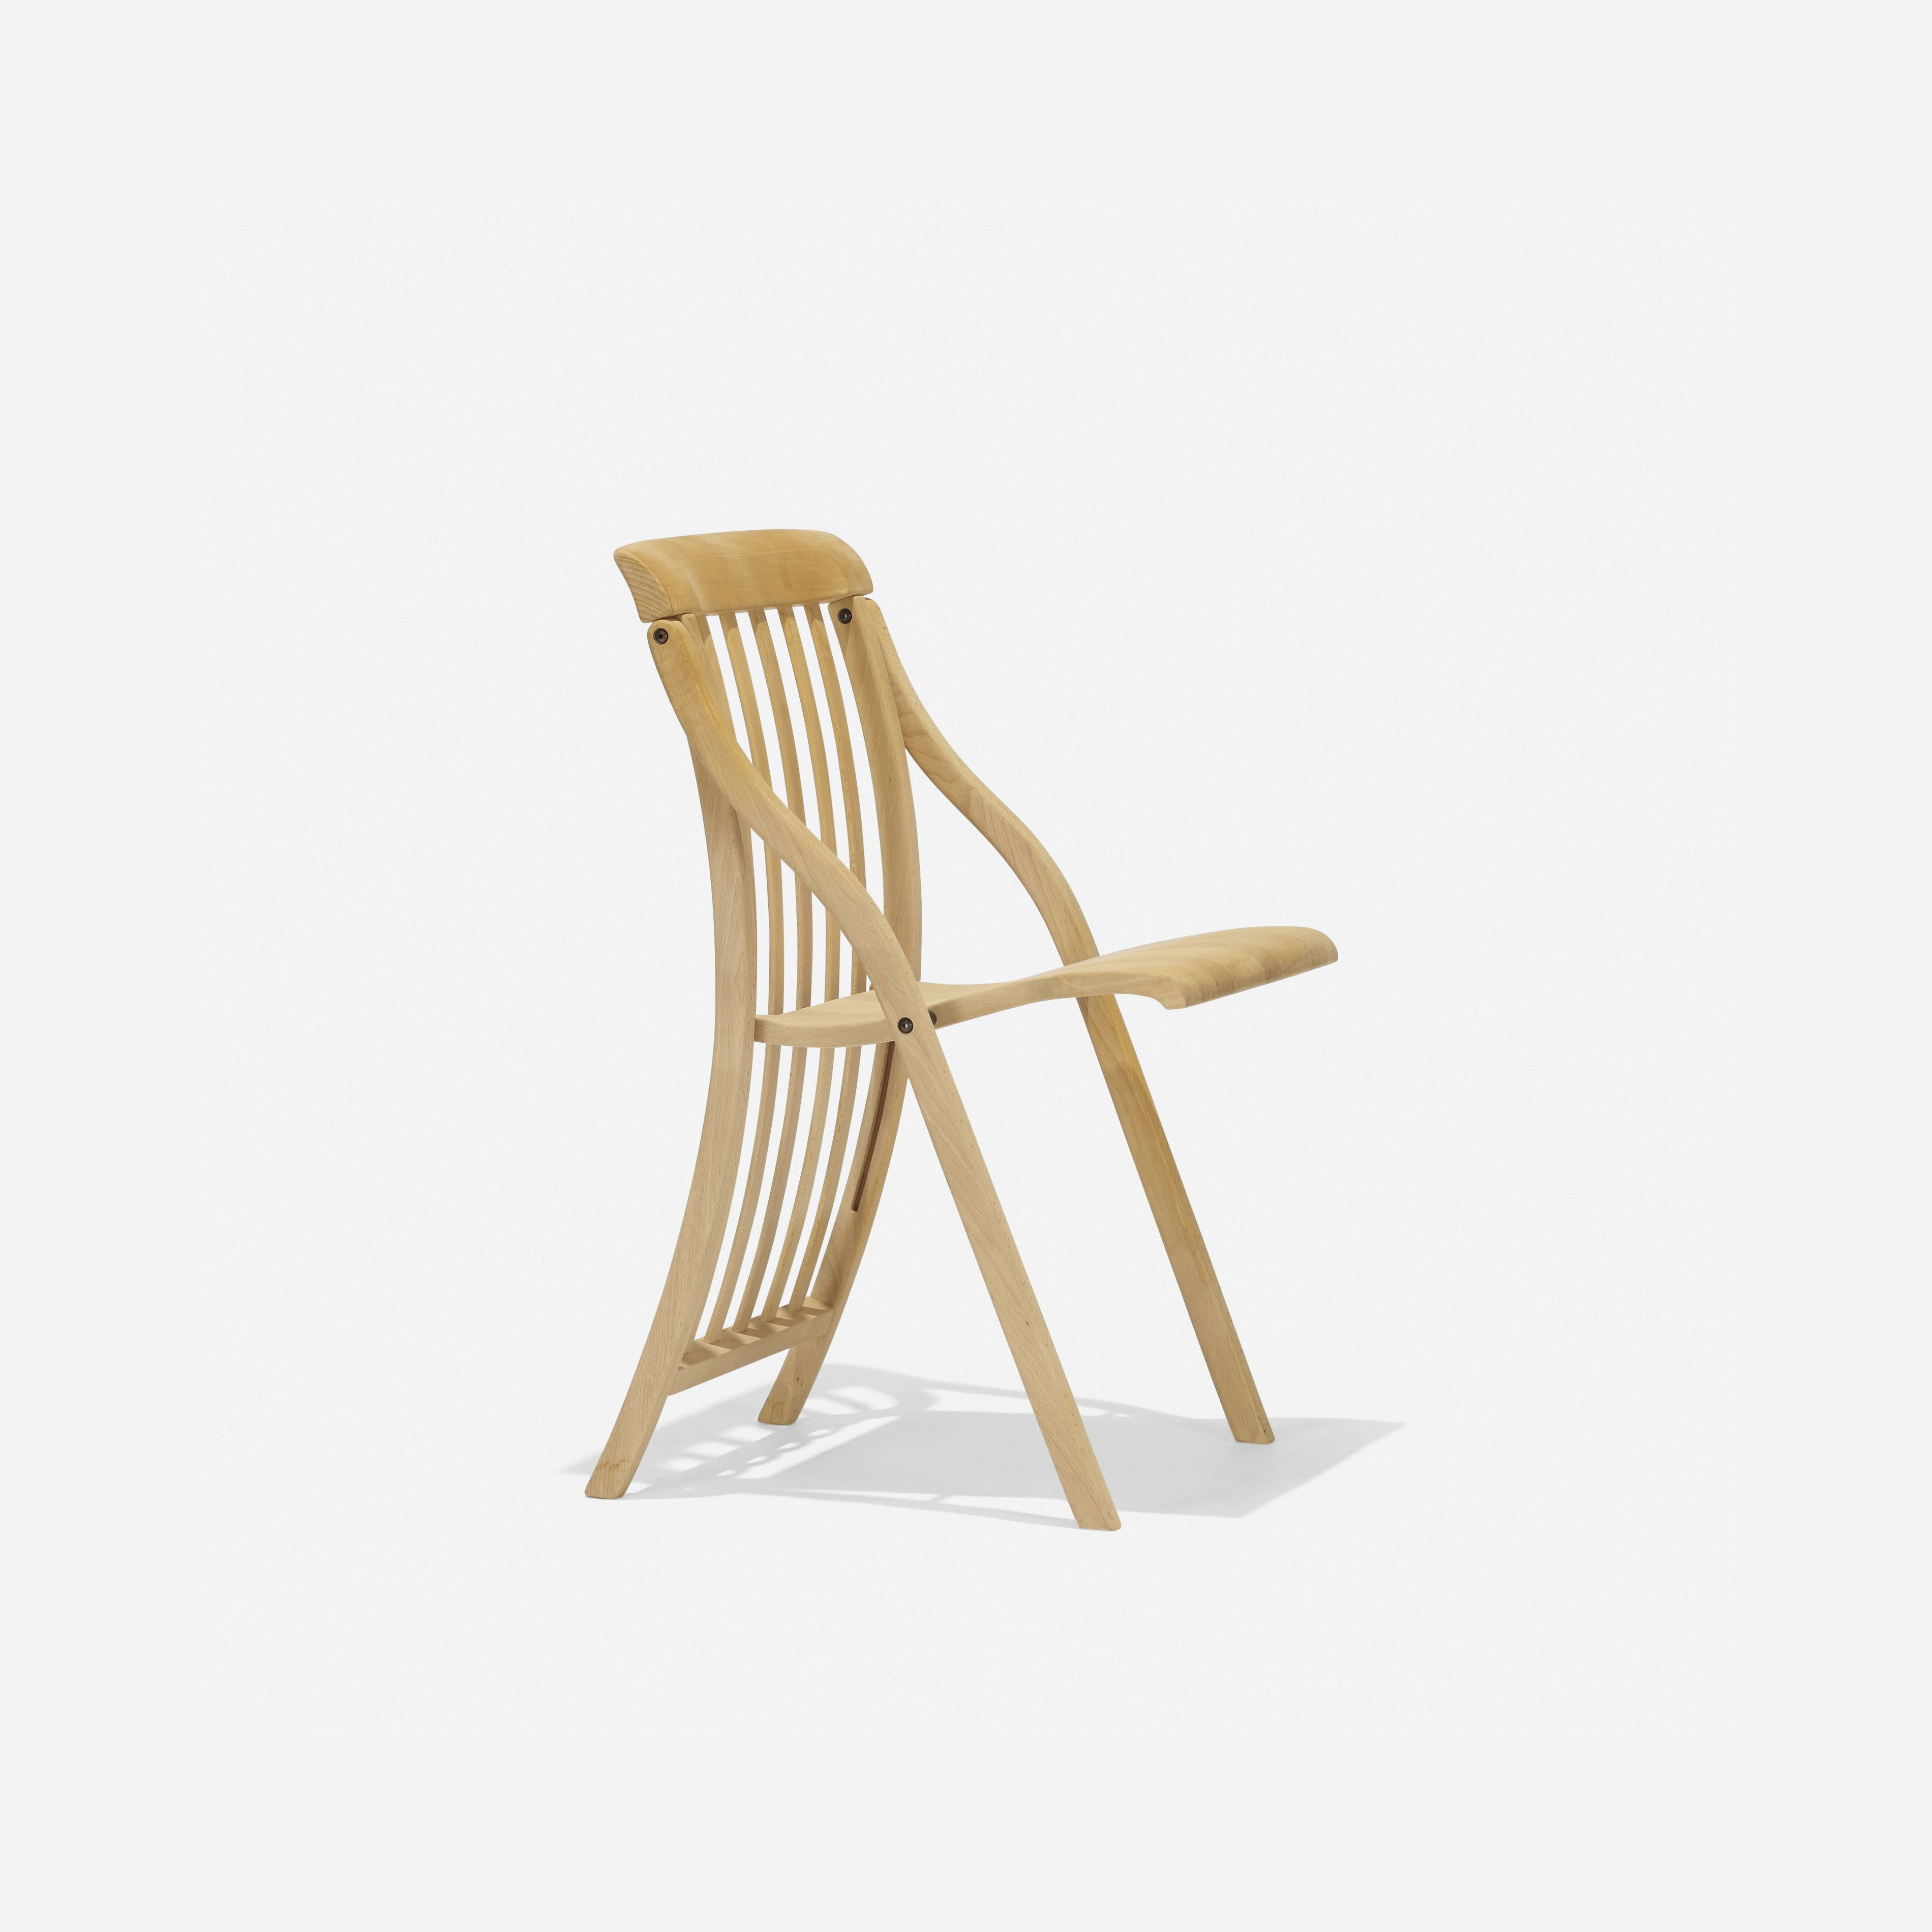 Michele de Lucchi Sedia folding chair 1993 beech 17¾ w x 21¾